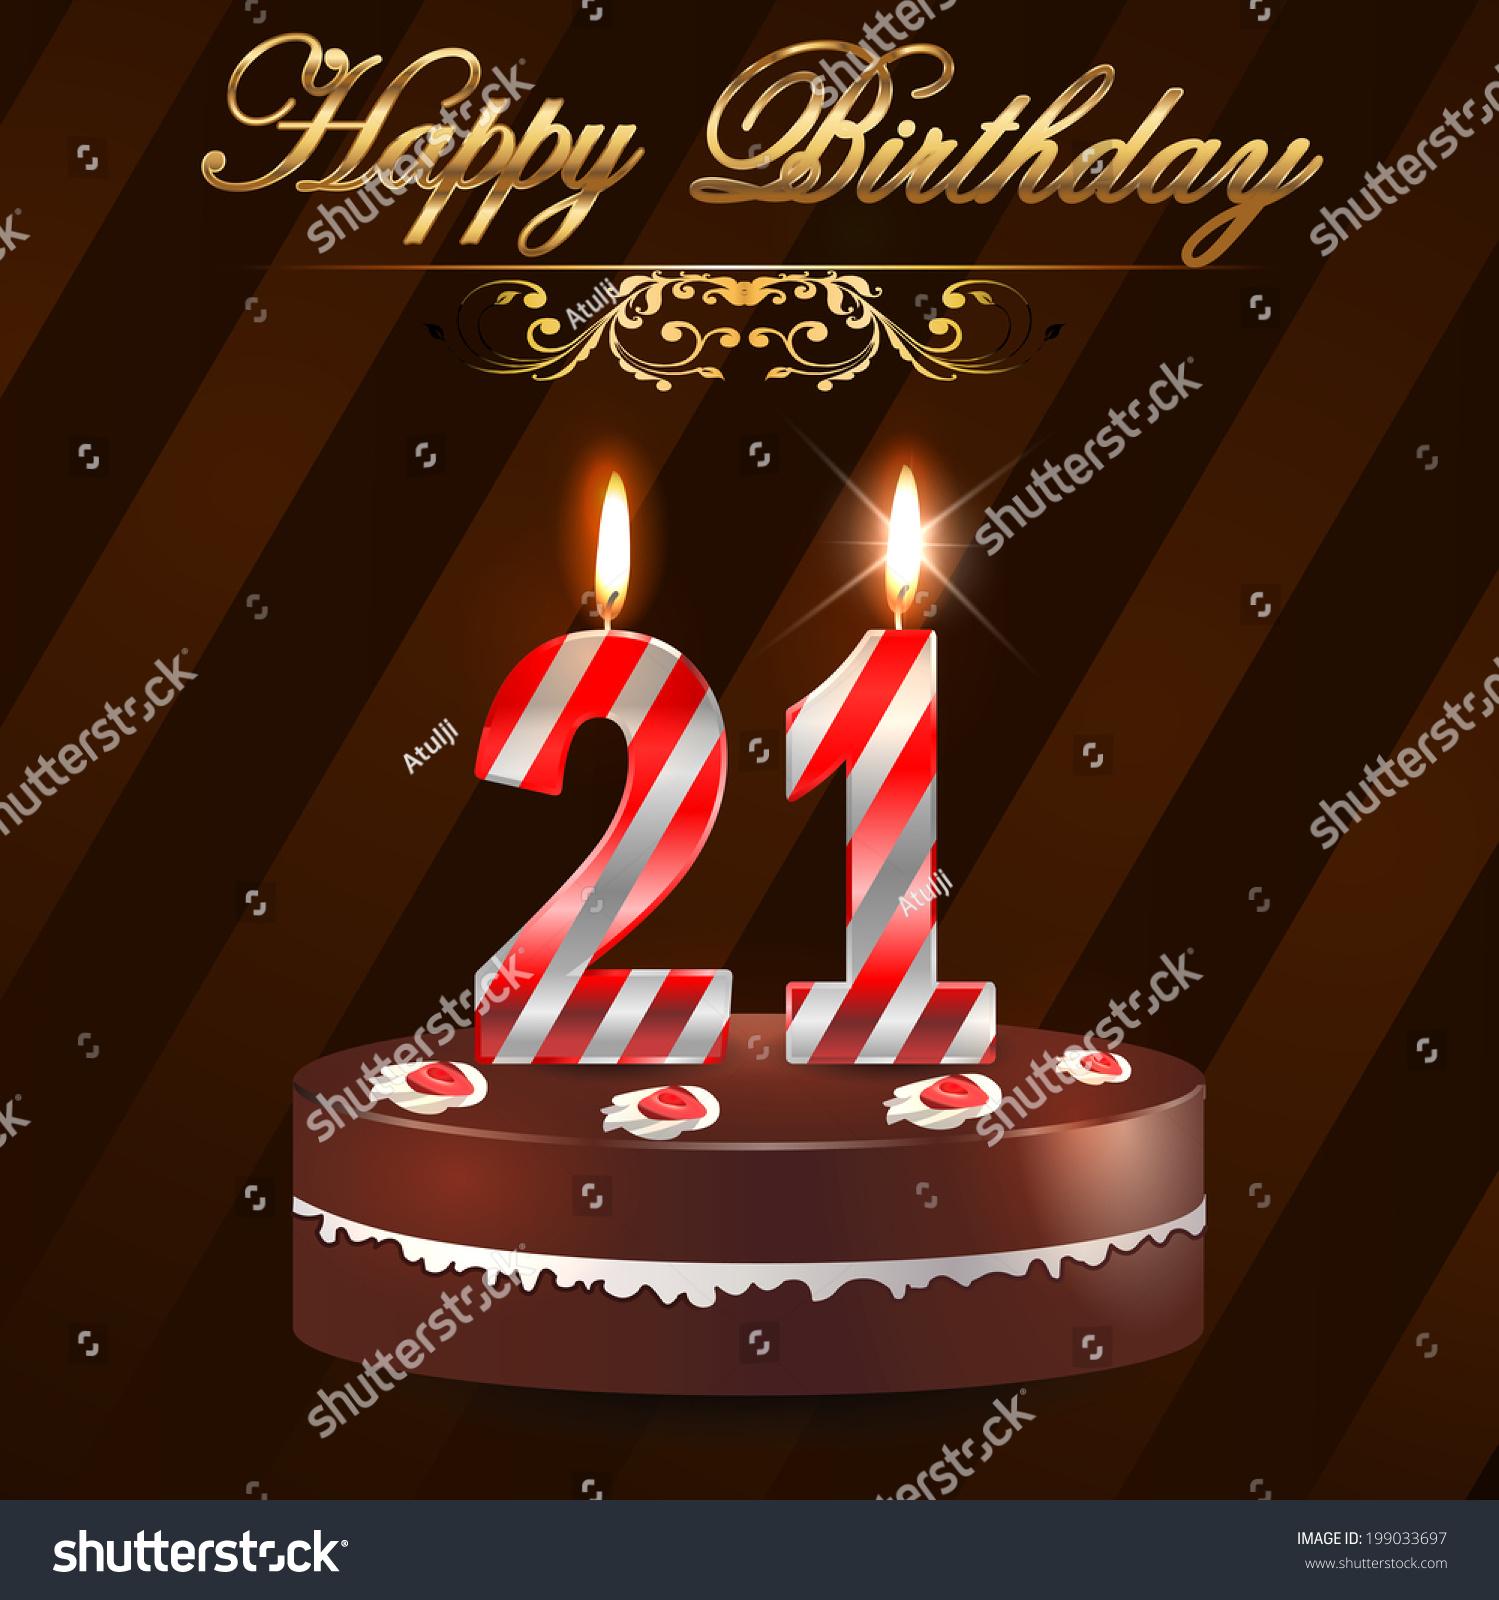 21 Year Happy Birthday Card Cake Stock Vector 199033697